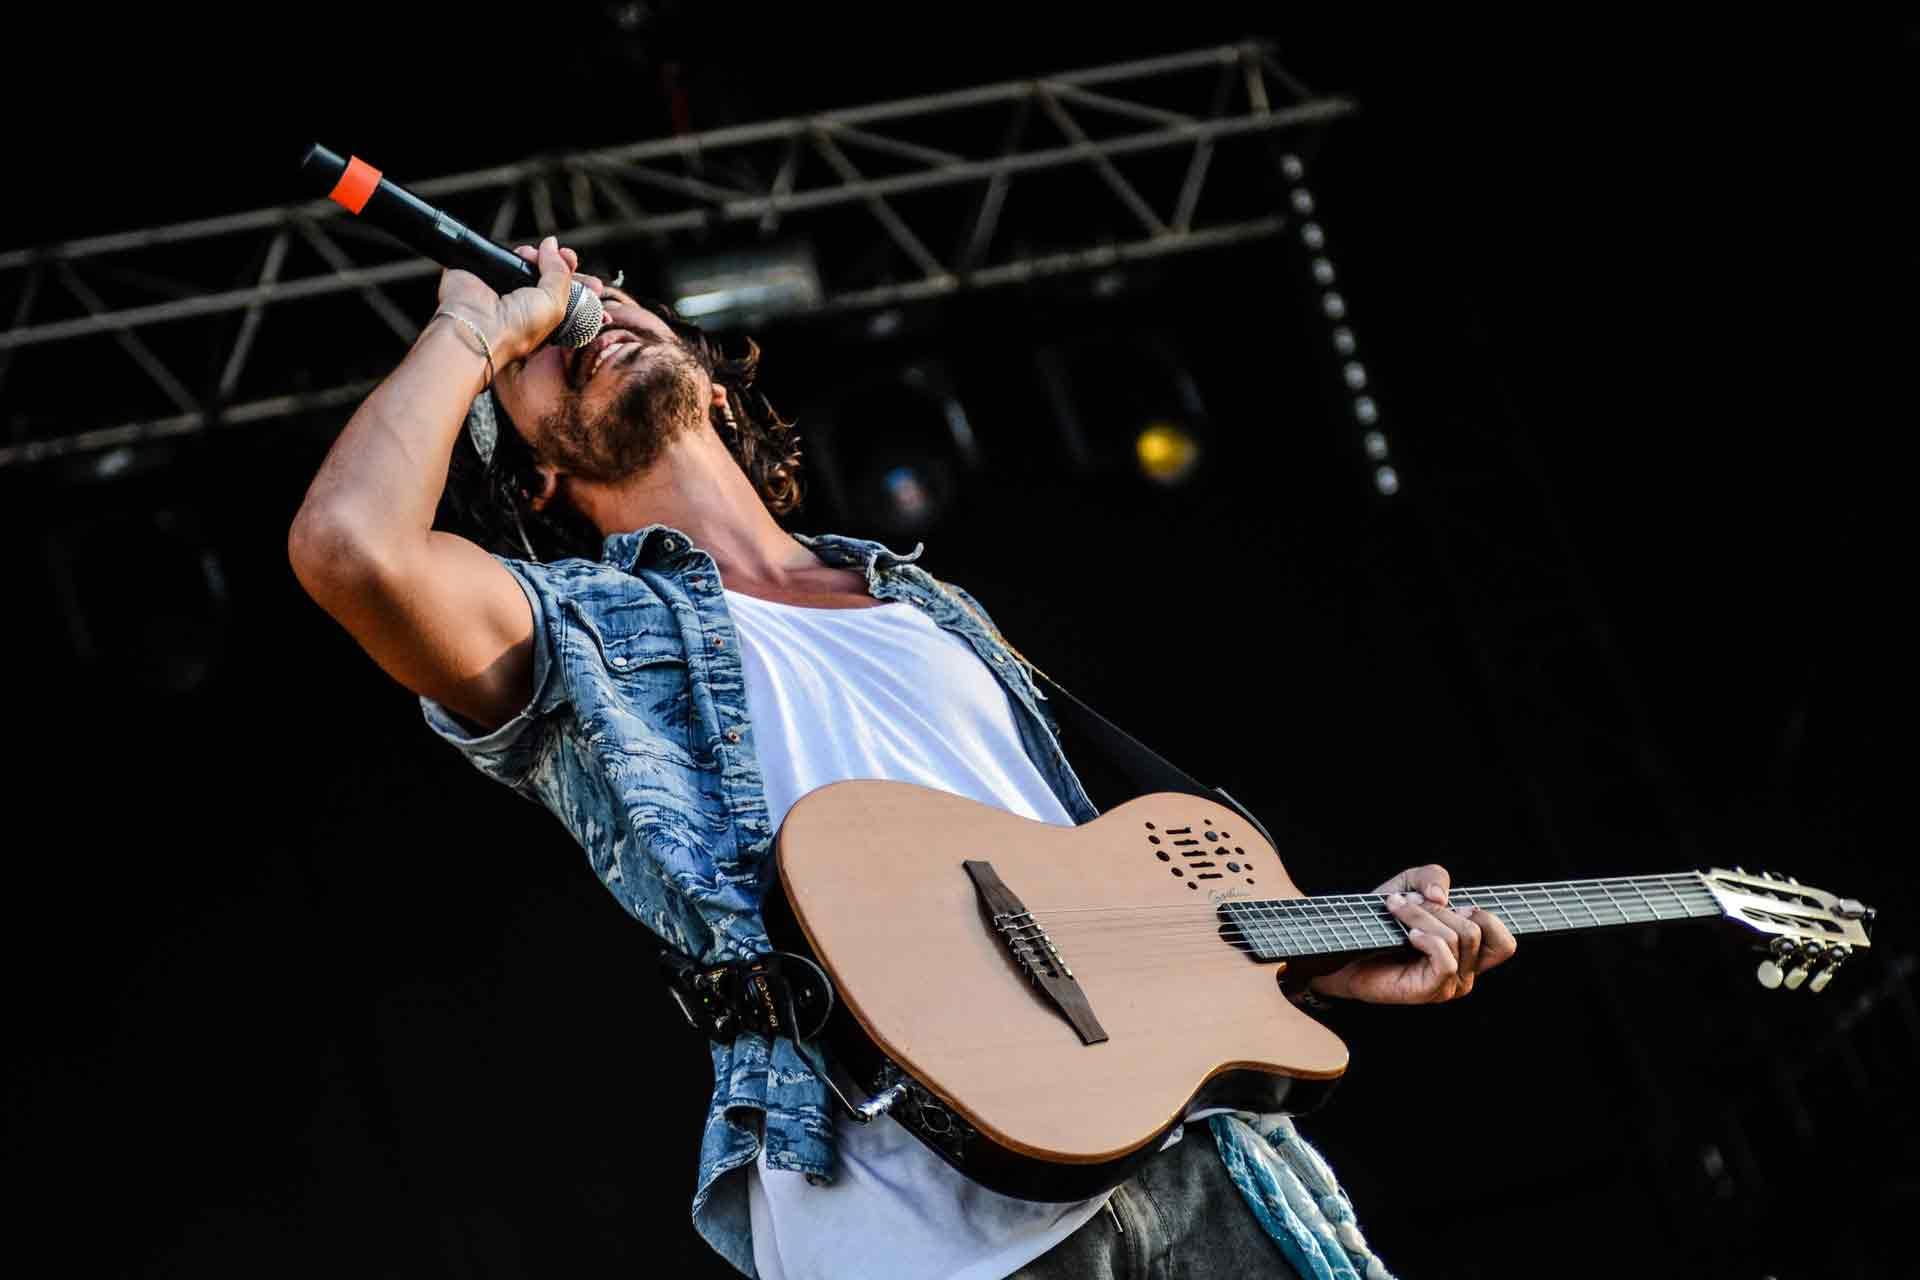 man-using-brown-and-black-electric-guitar-while-singing-167446